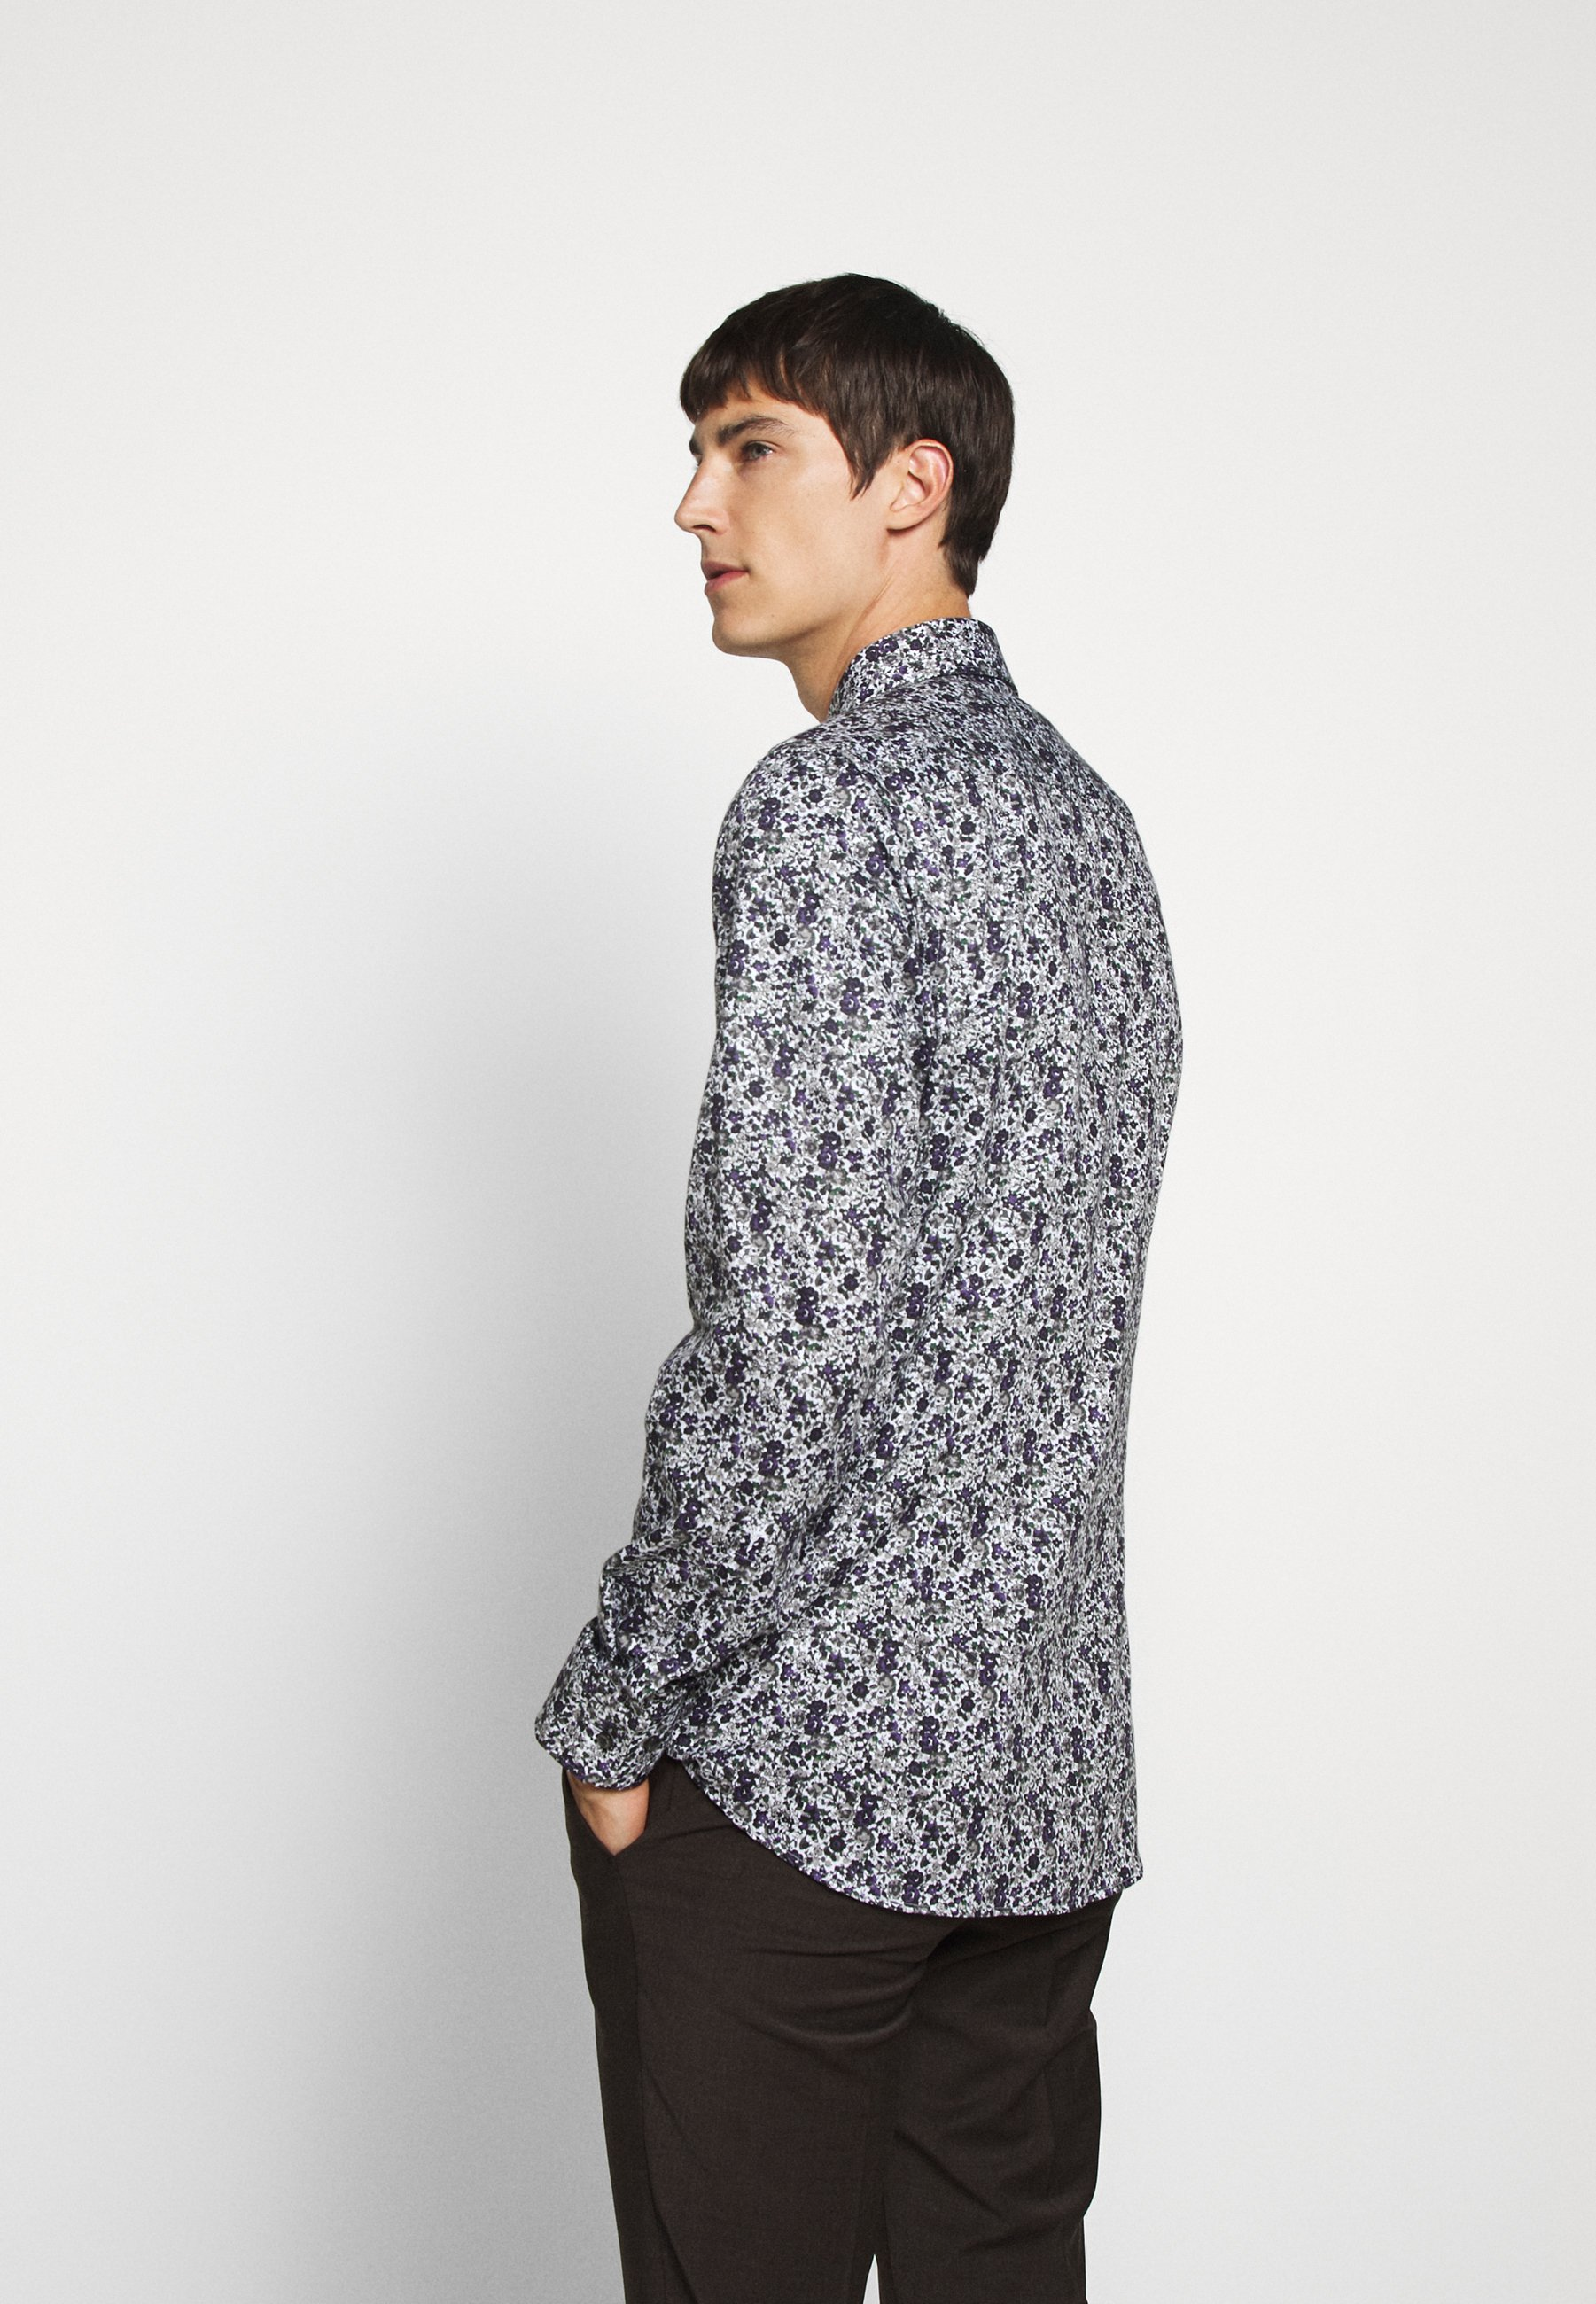 JOOP! PAJOS  - Camicia - dark grey - Abbigliamento da uomo Esclusivo